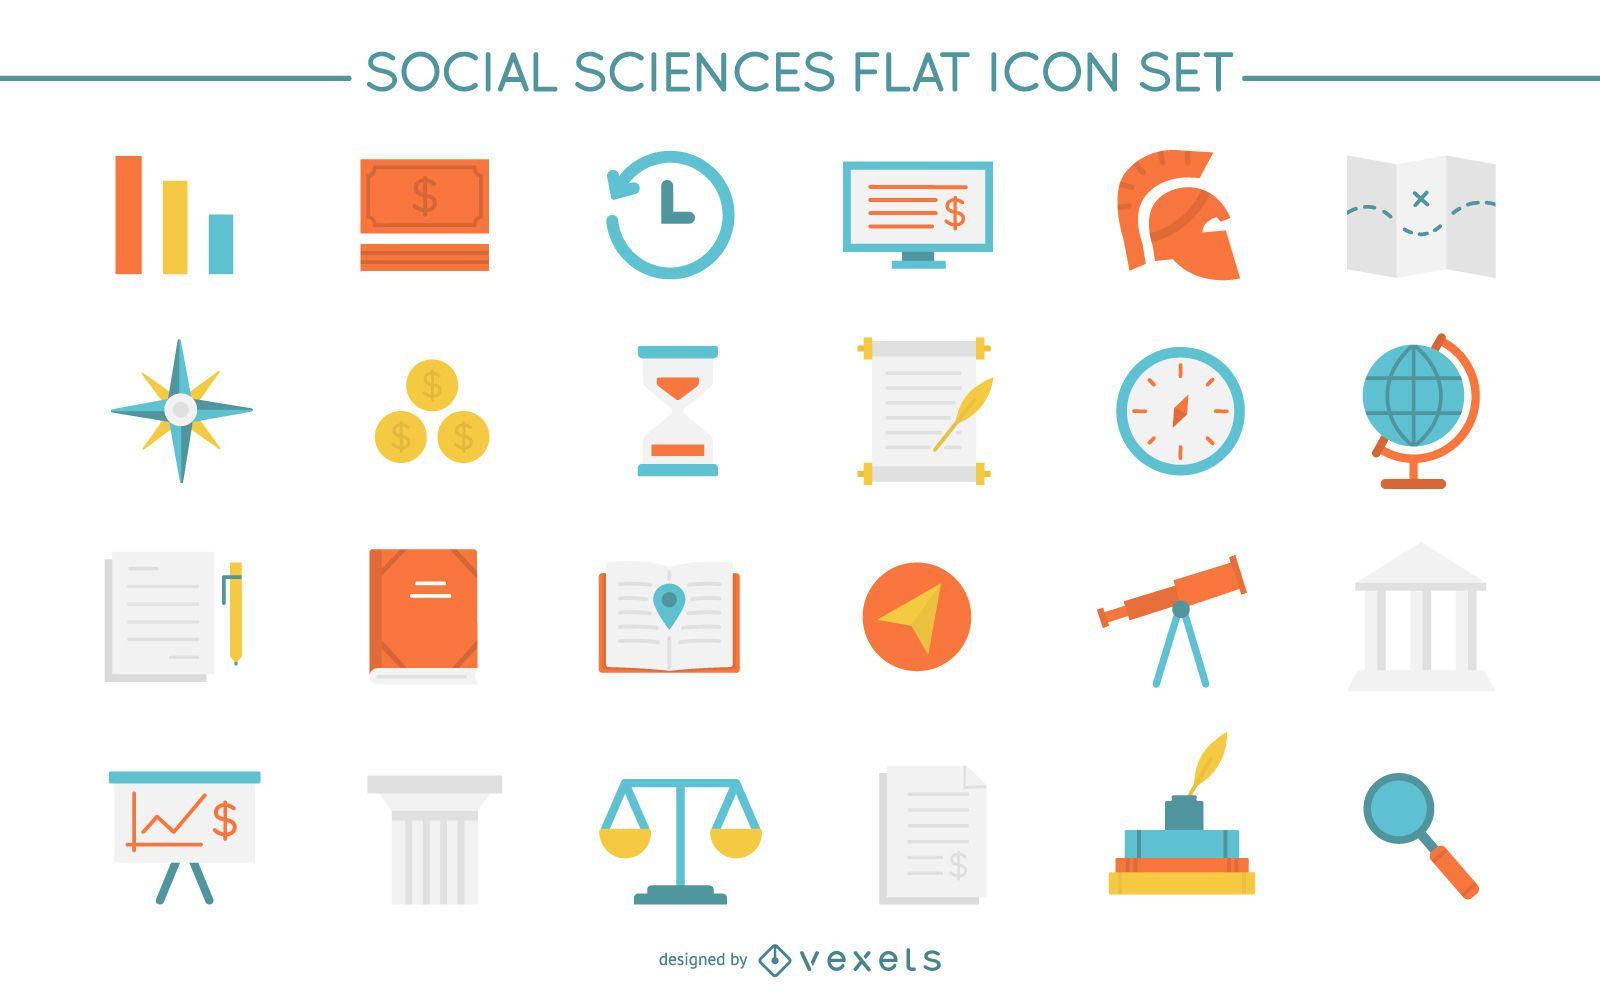 Social sciences flat icon set